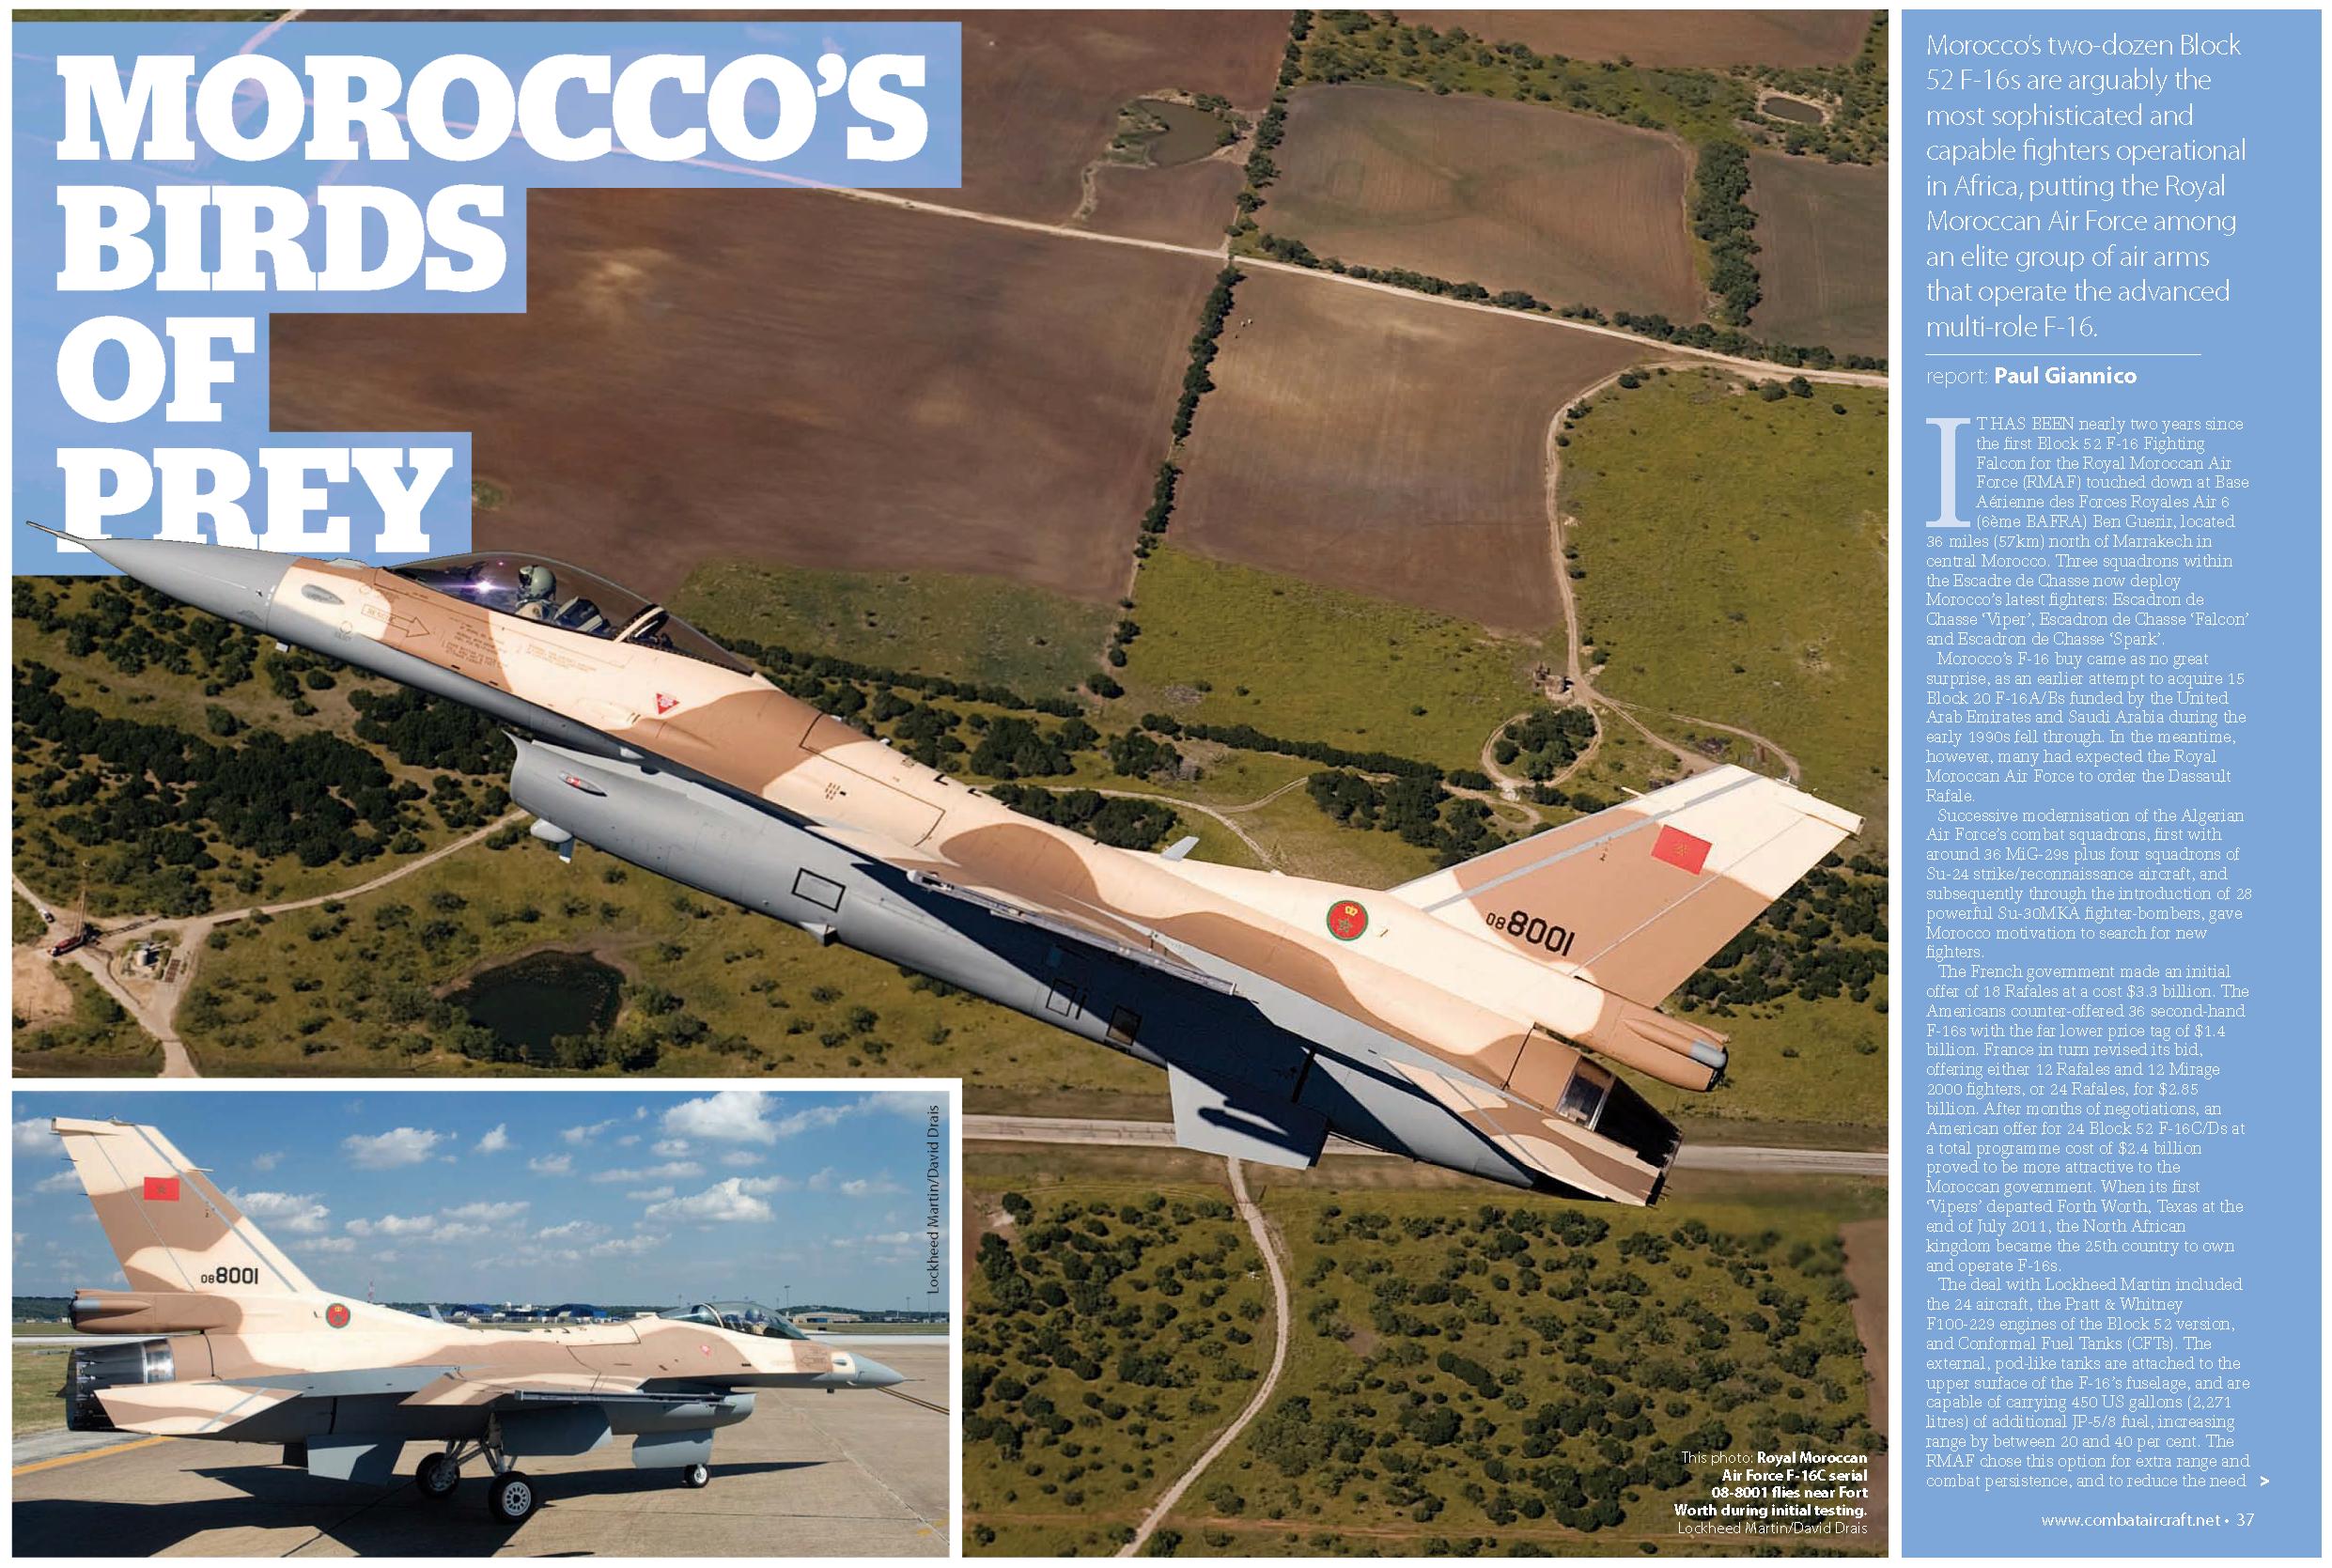 Moroccan F-16 Atlas Falcon / RMAF F16 block 52+ - Page 31 50902714688_6712cefe43_o_d